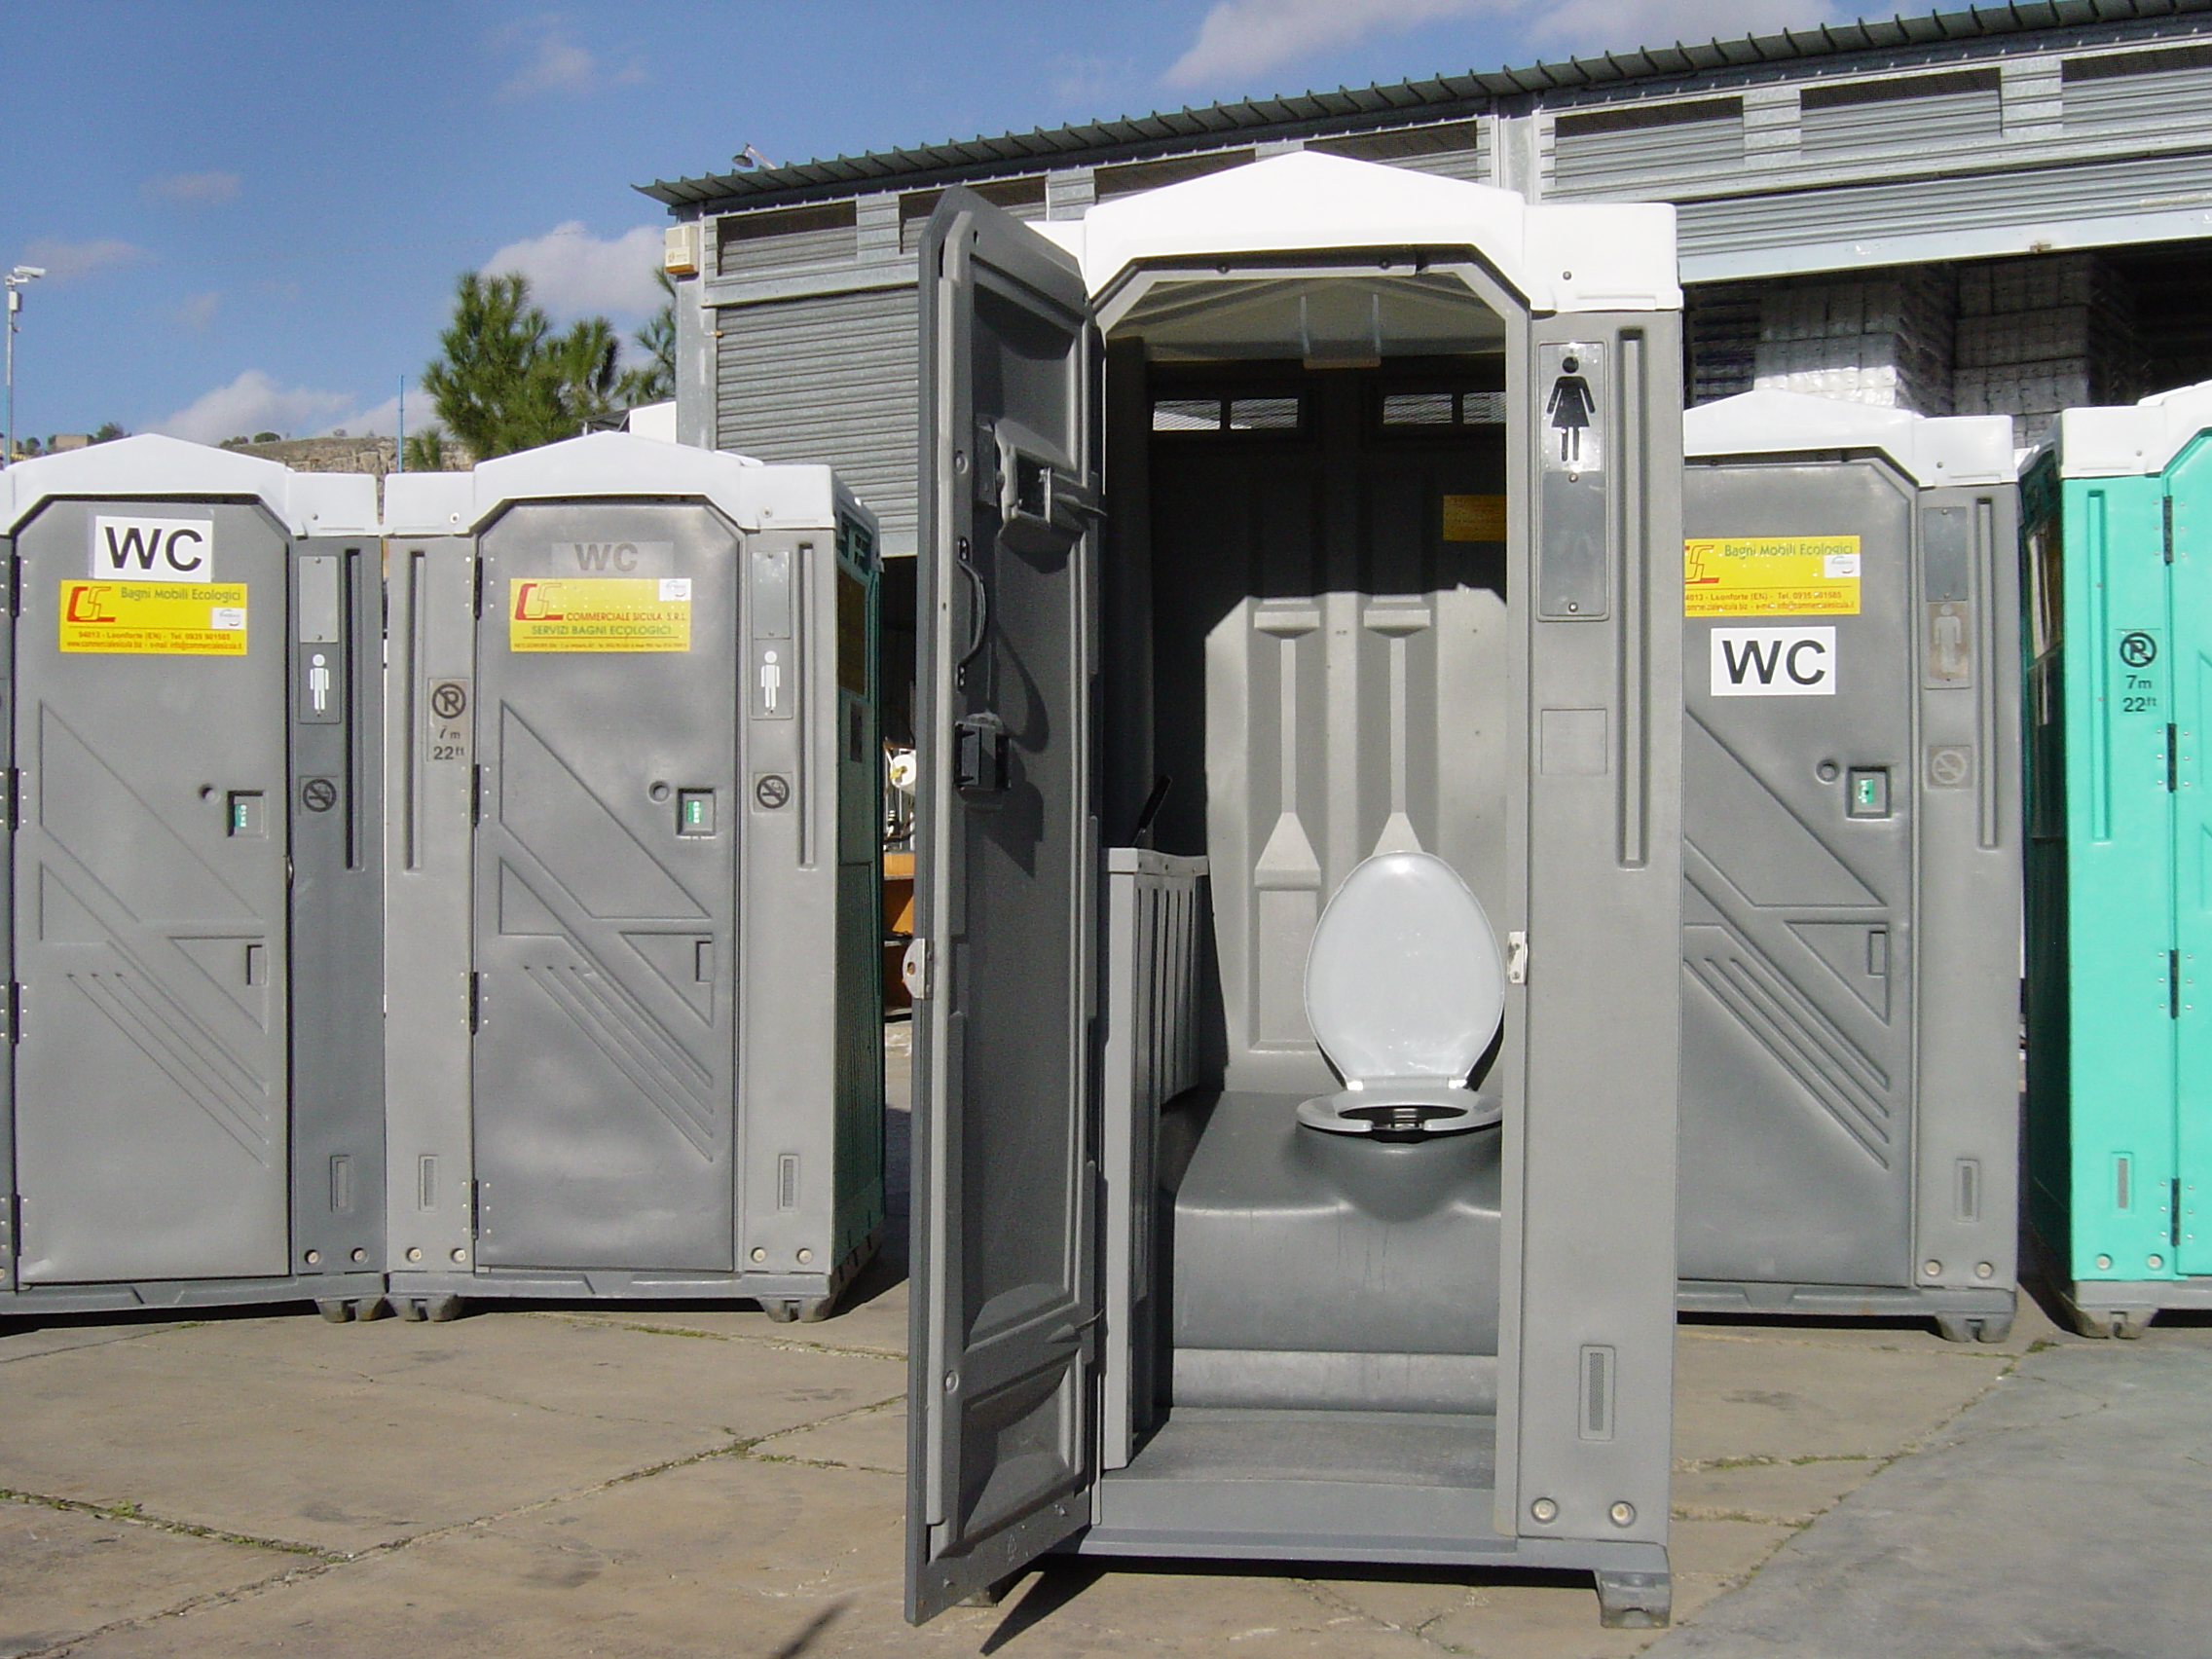 commerciale sicula   bagni mobili ecologici